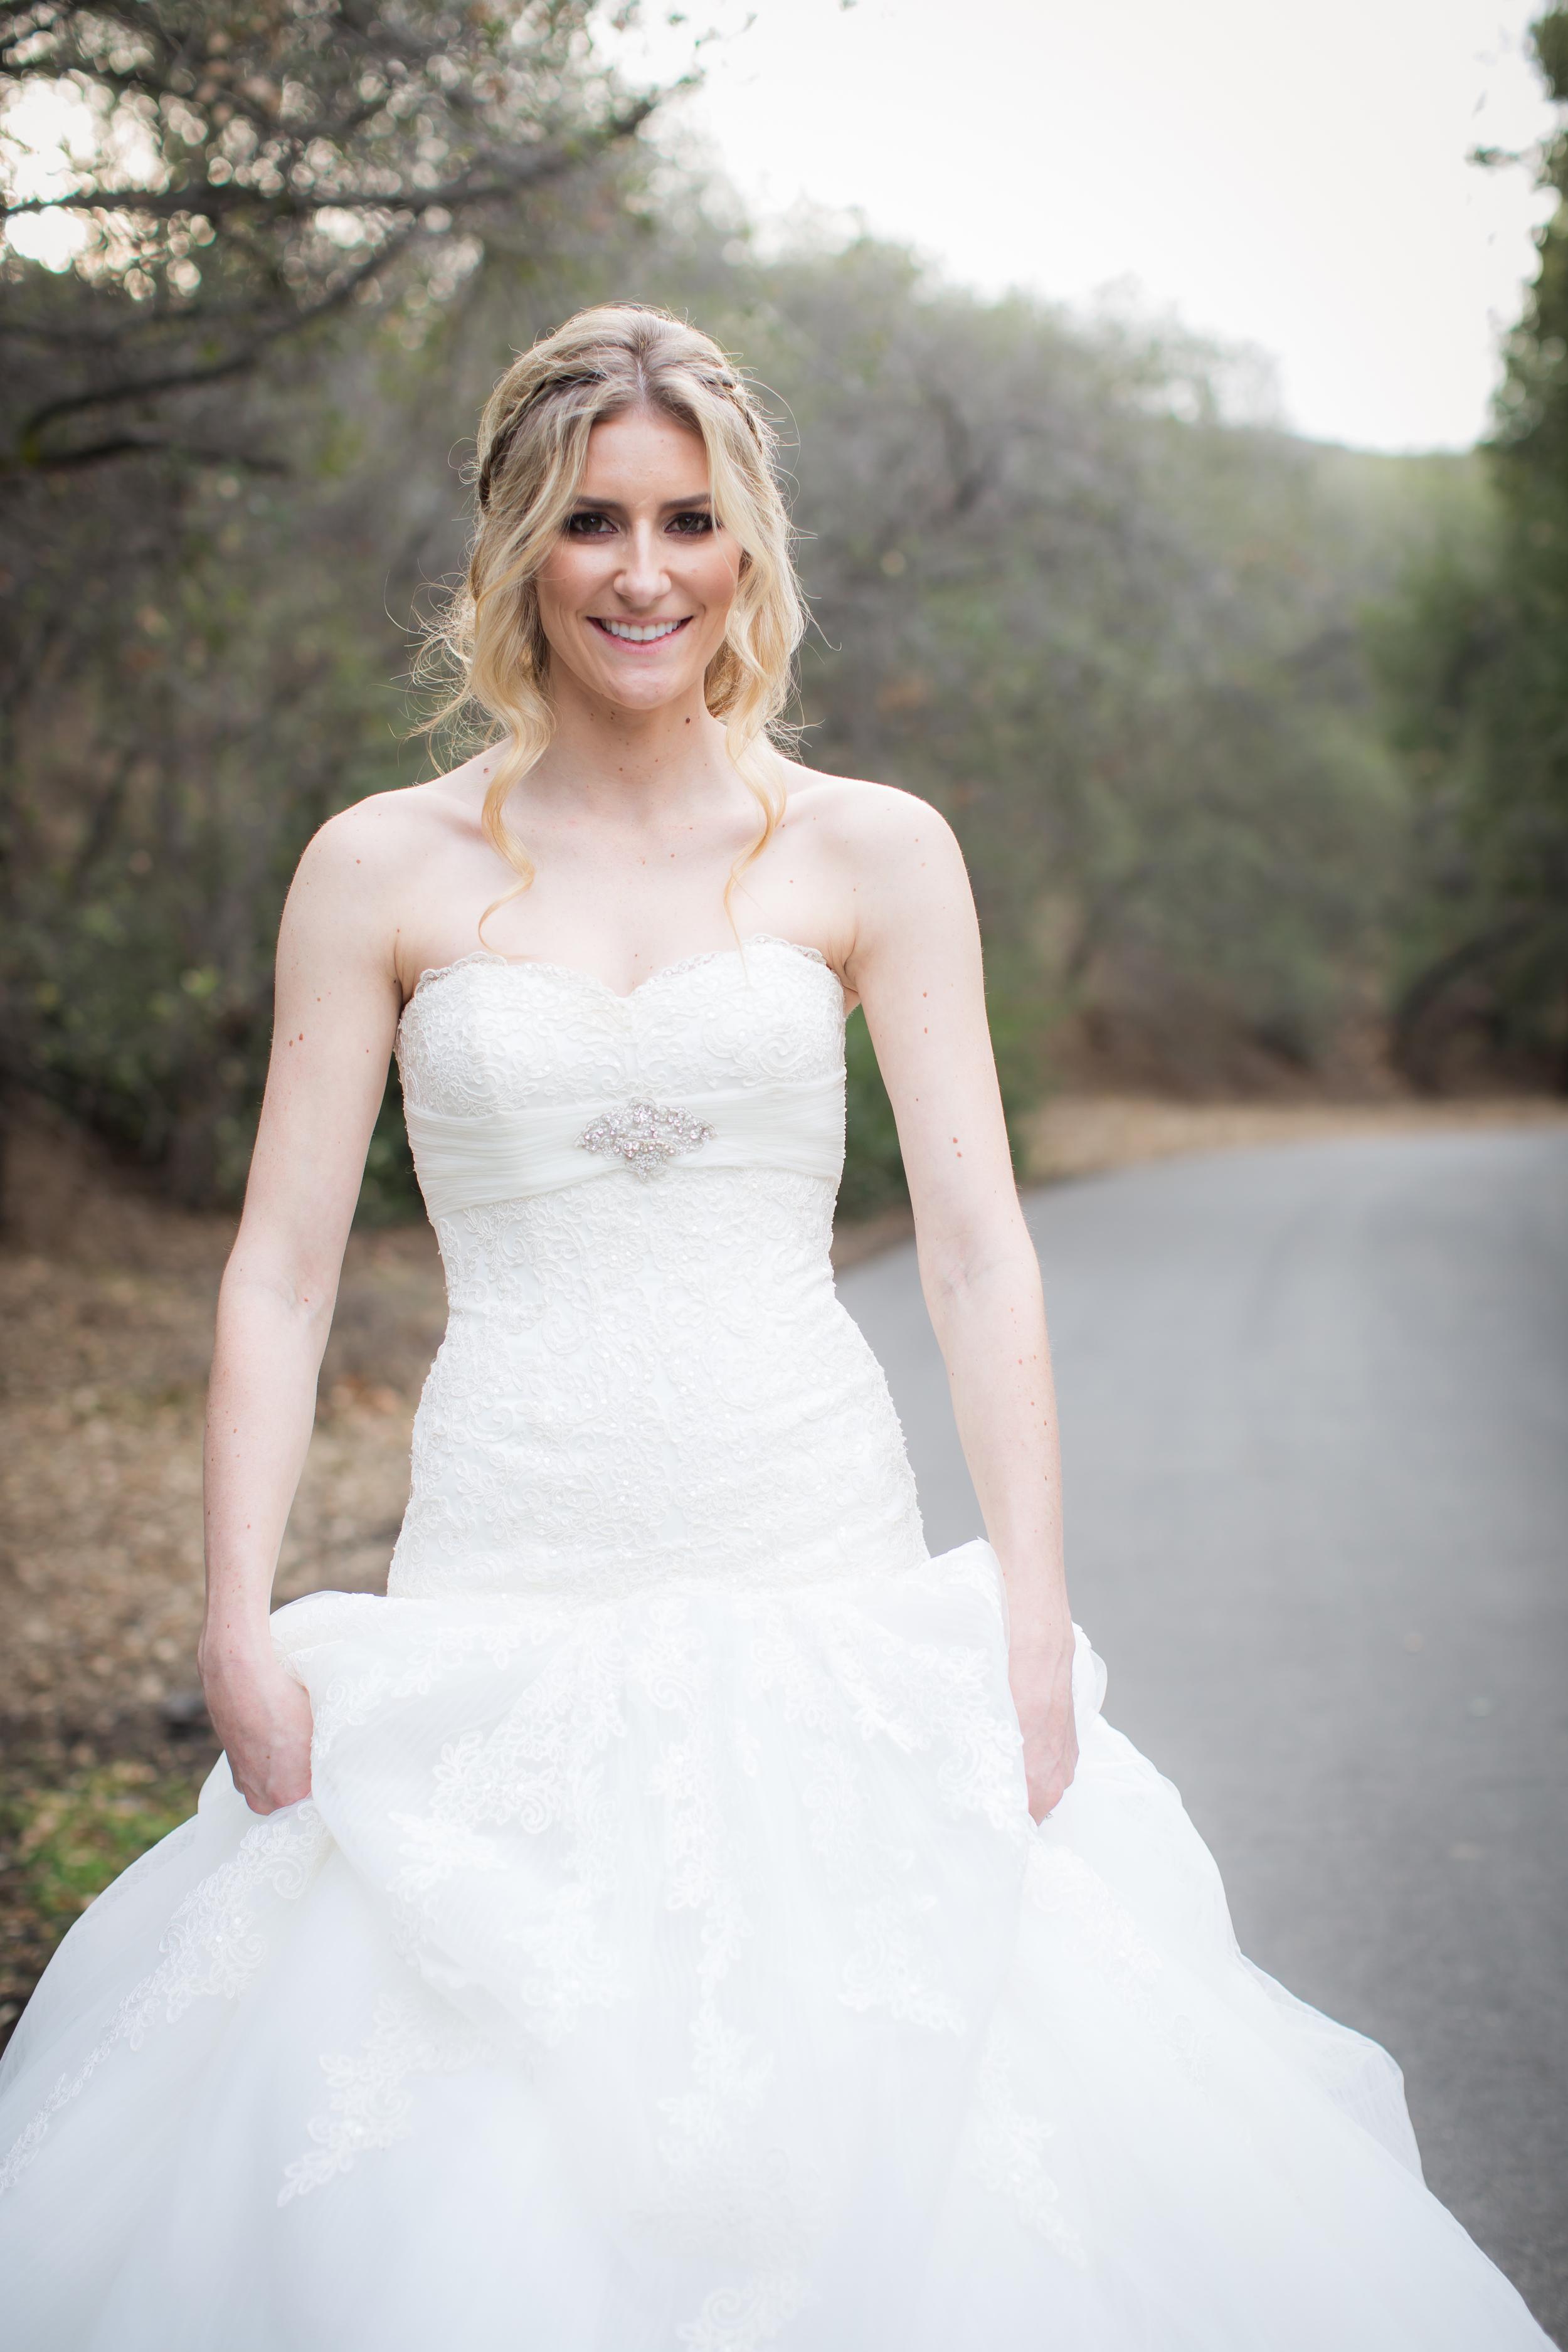 Theresa Bridget Photography // Dress: Lovella Bridal